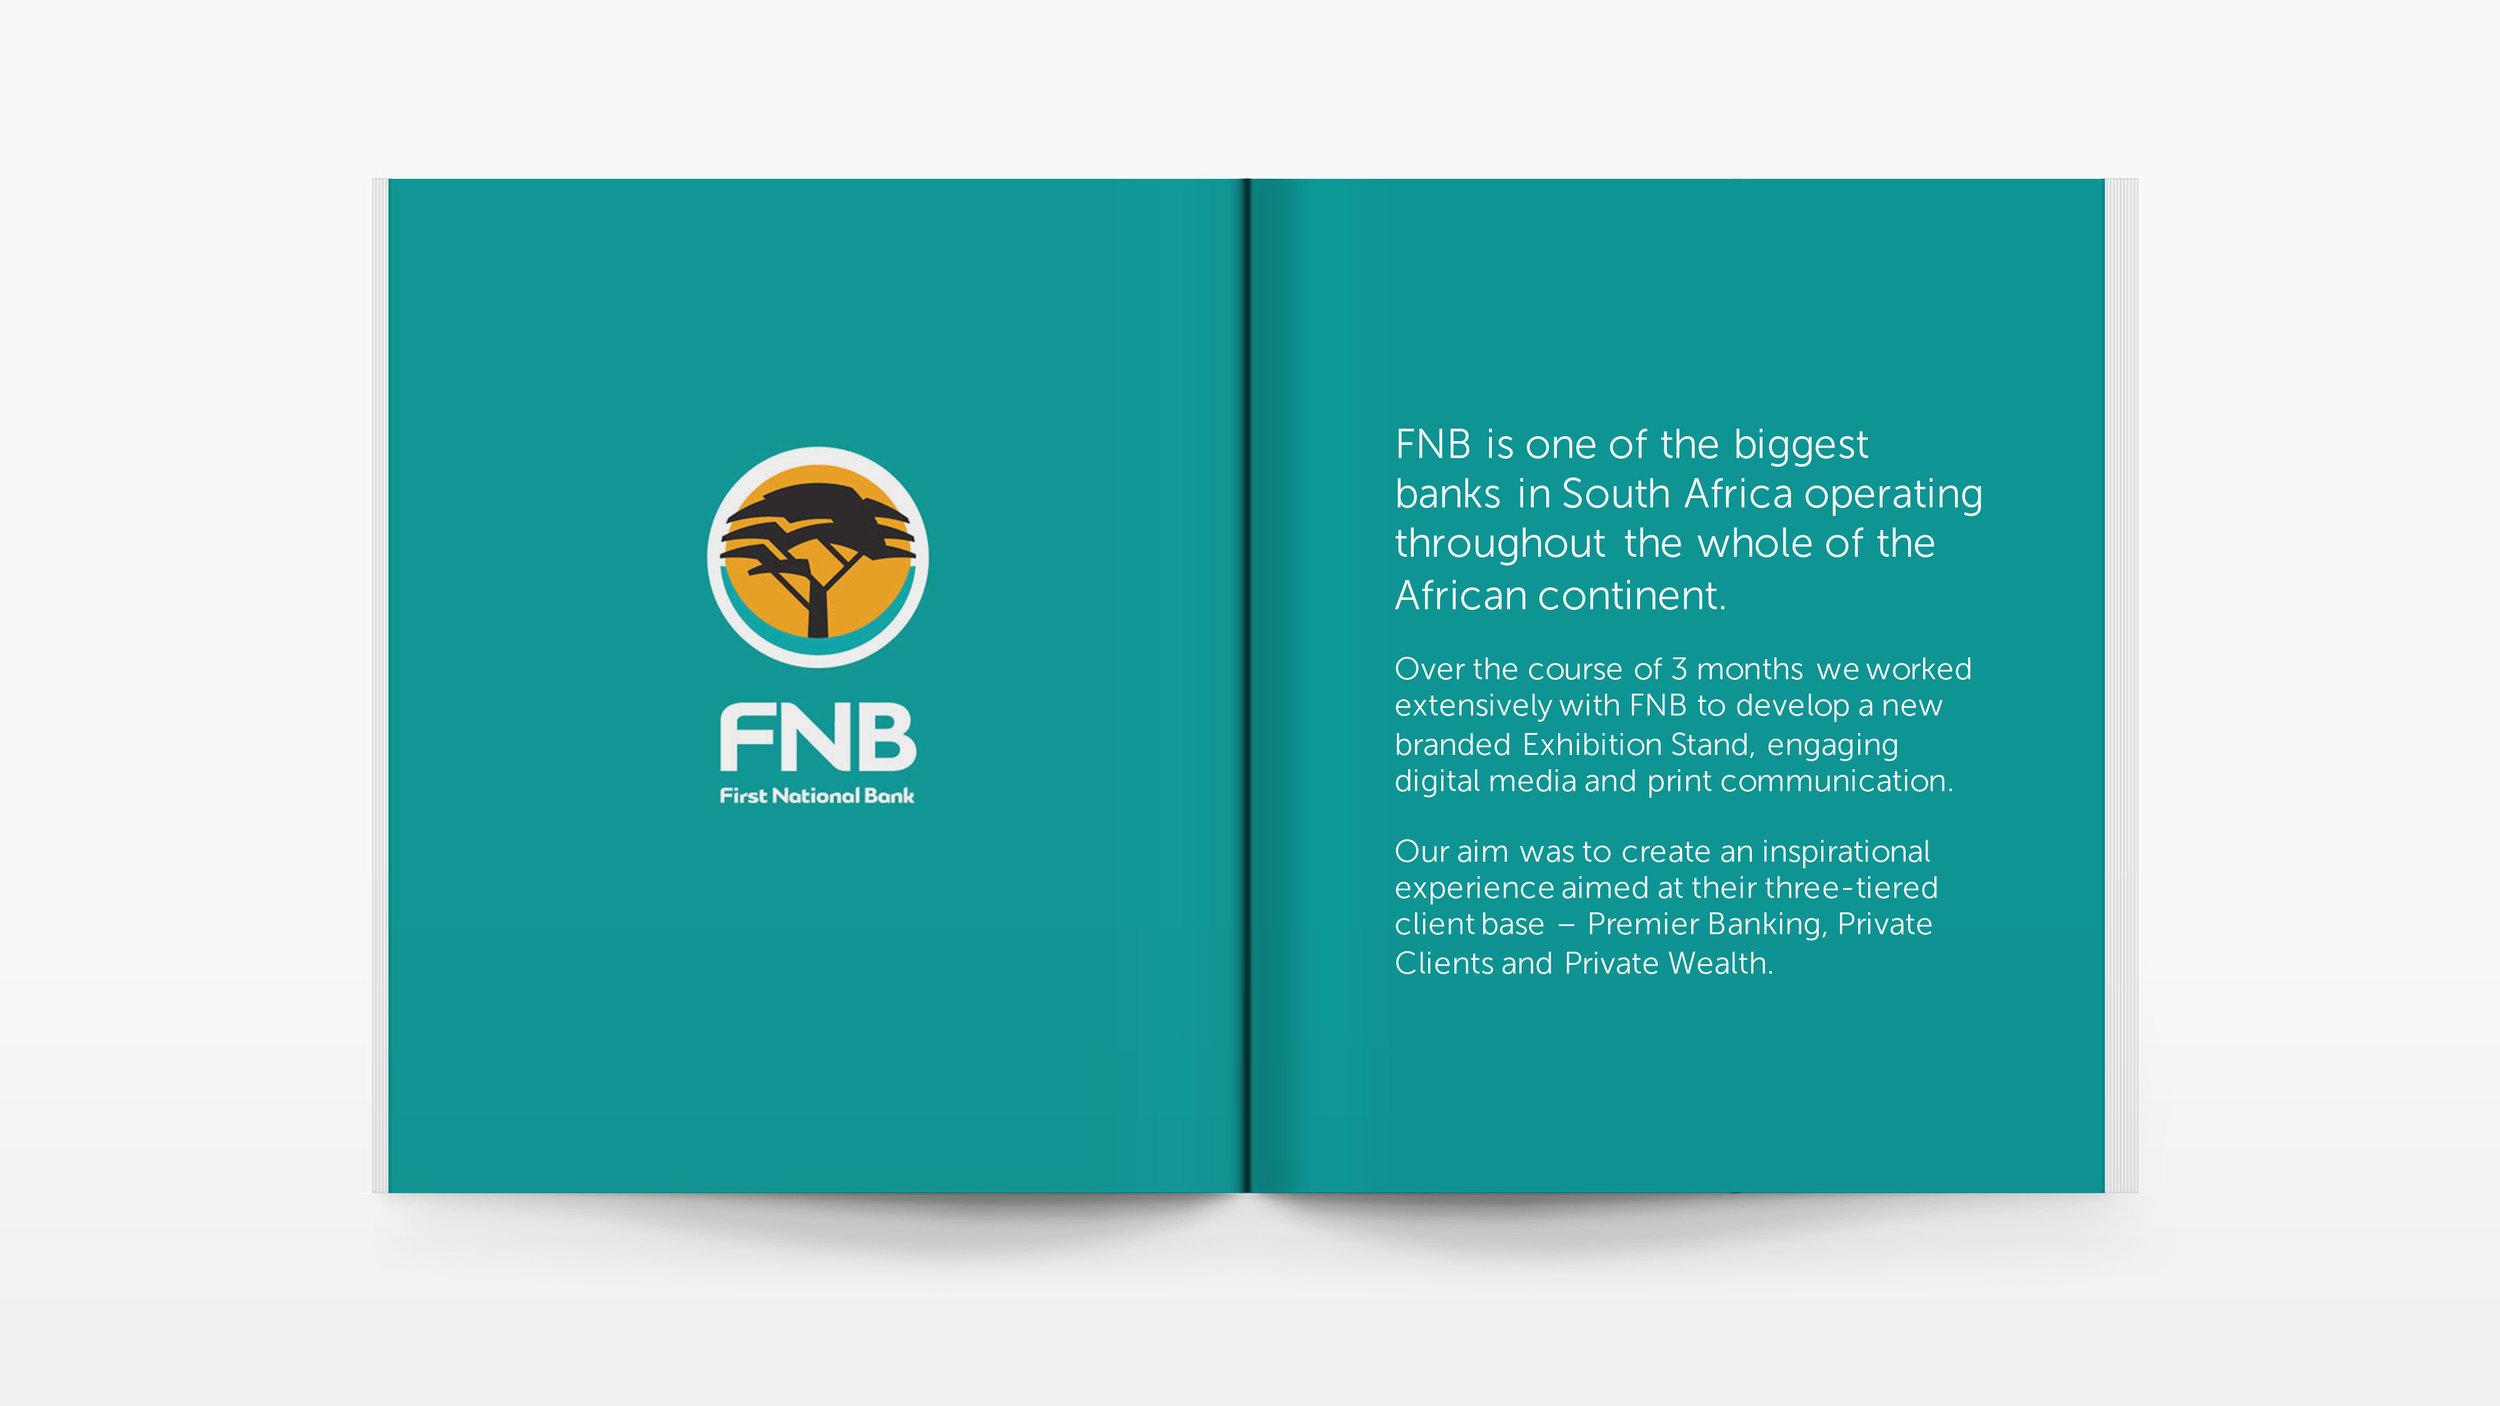 Brand_republica_FNB_book_intro_design.jpg